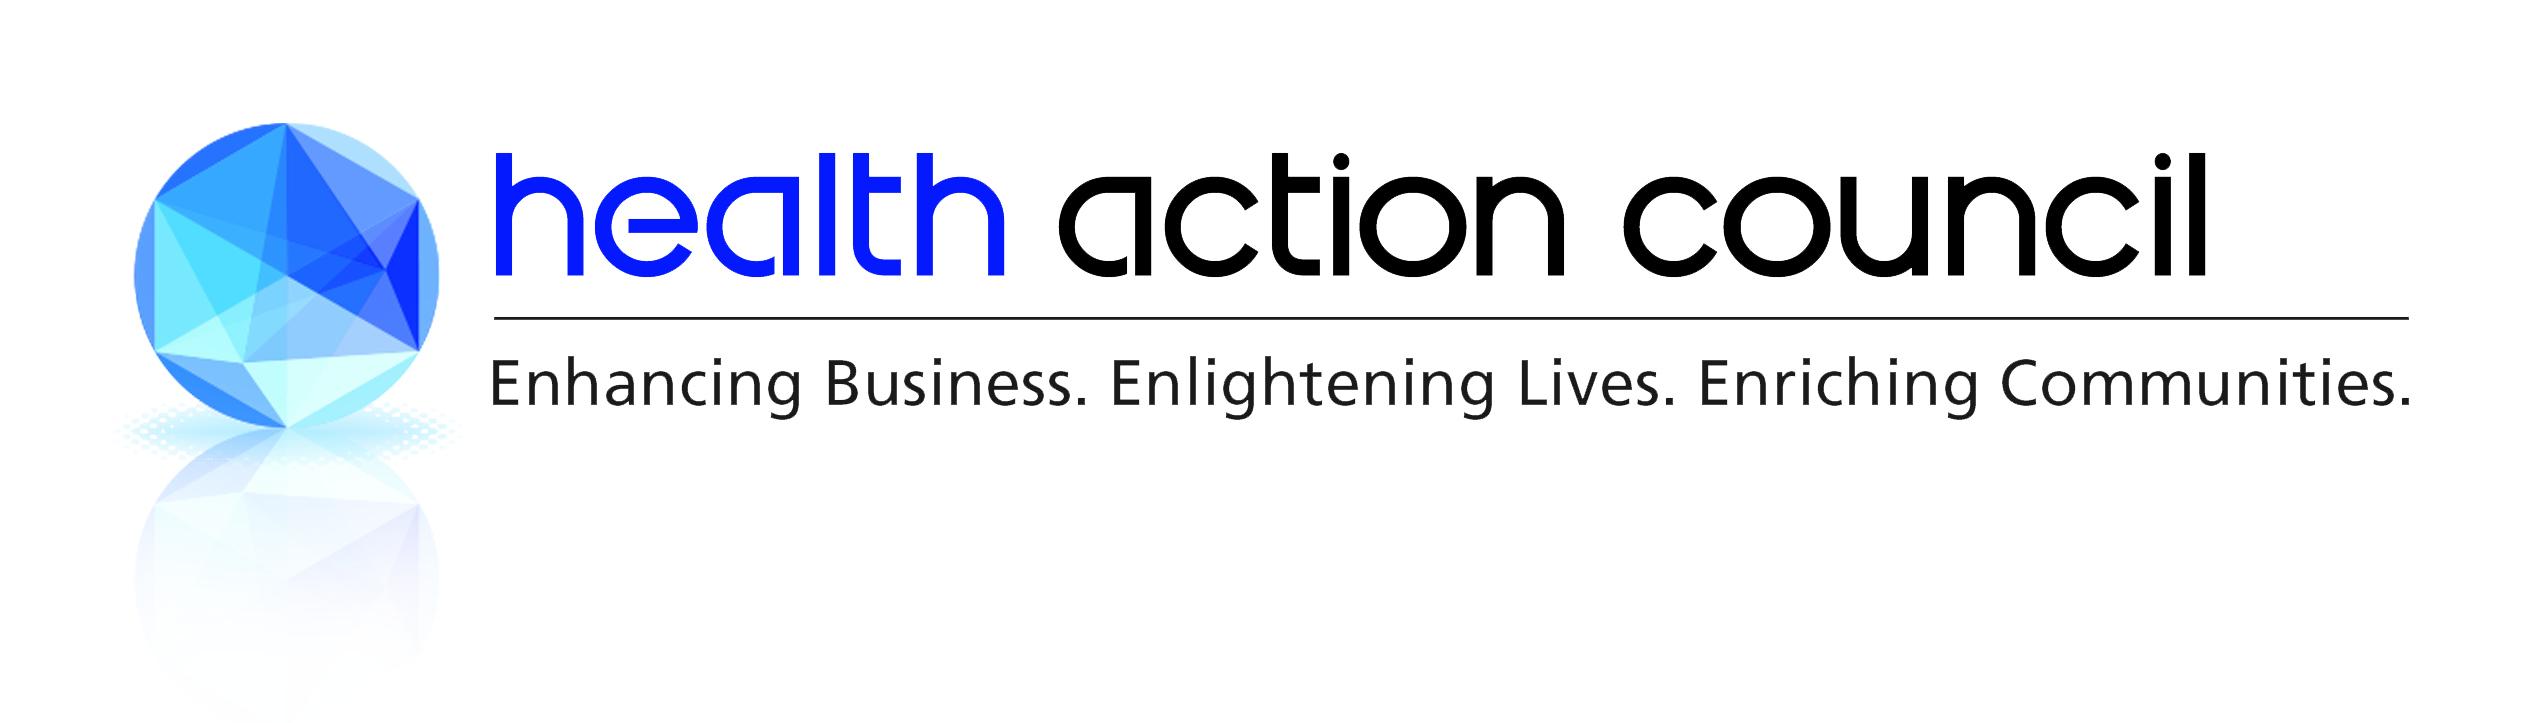 Health Action Council